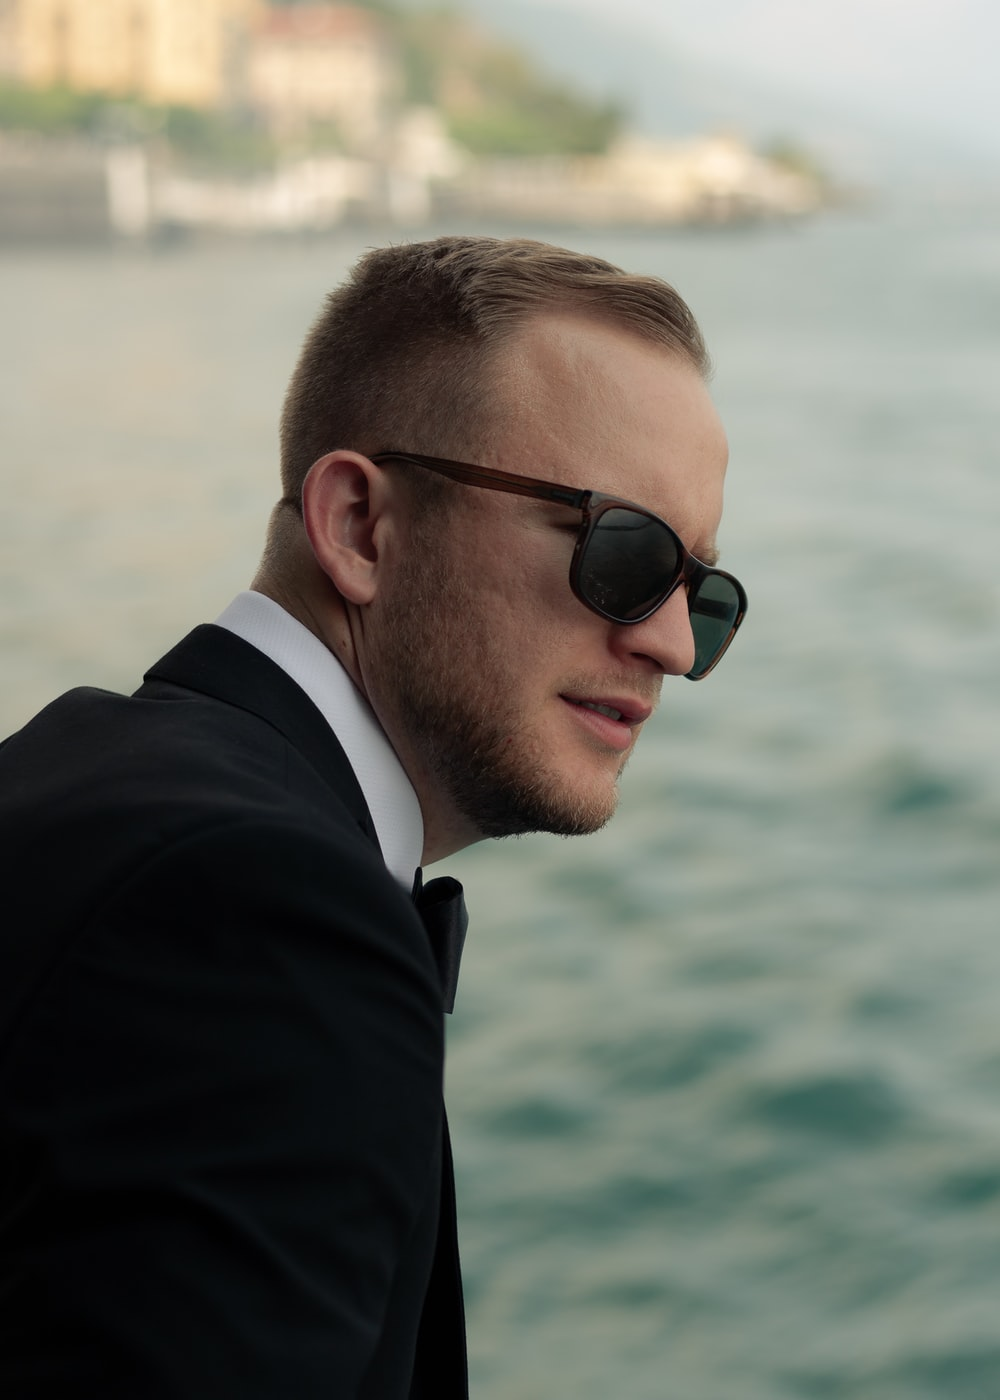 man wearing black tuxedo and black wayfarer sunglasses